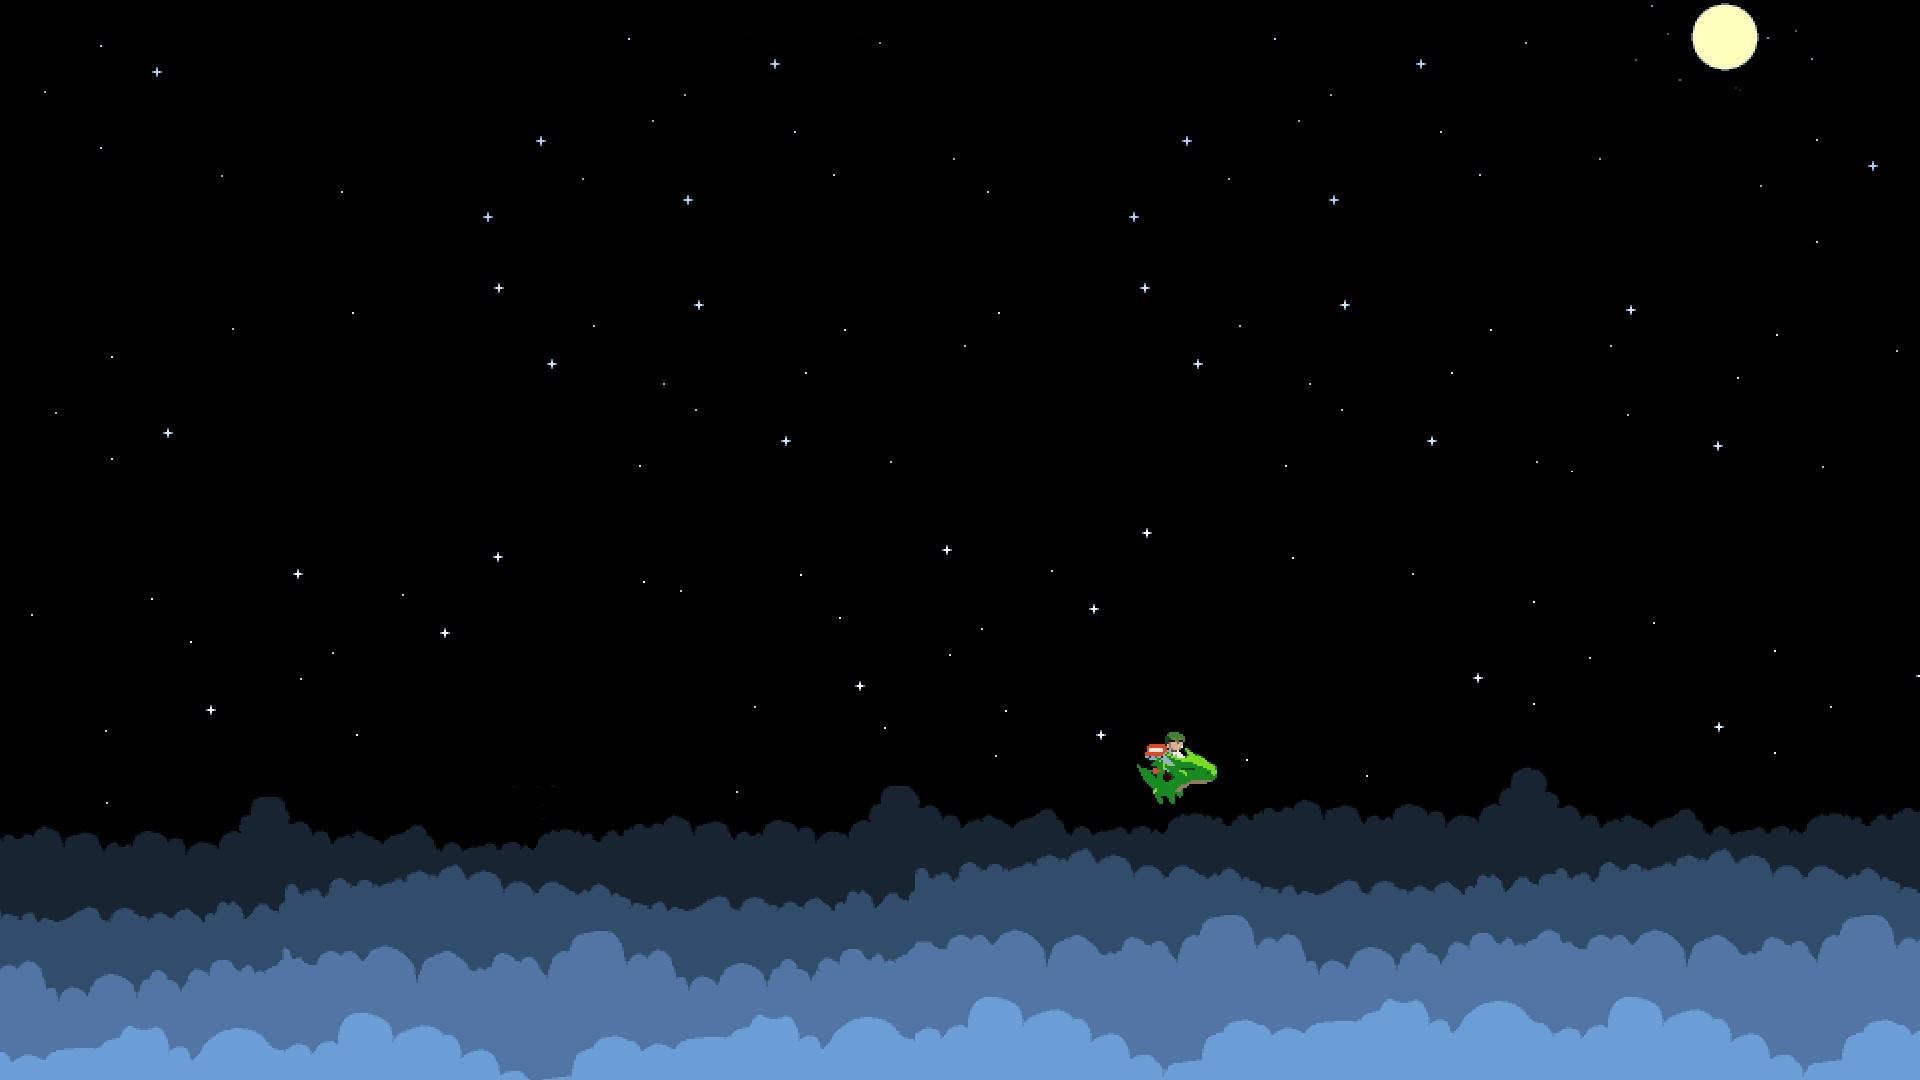 General 1920x1080 pixels pixel art 8-bit Moon stars video games space dragon clouds cave story video game art